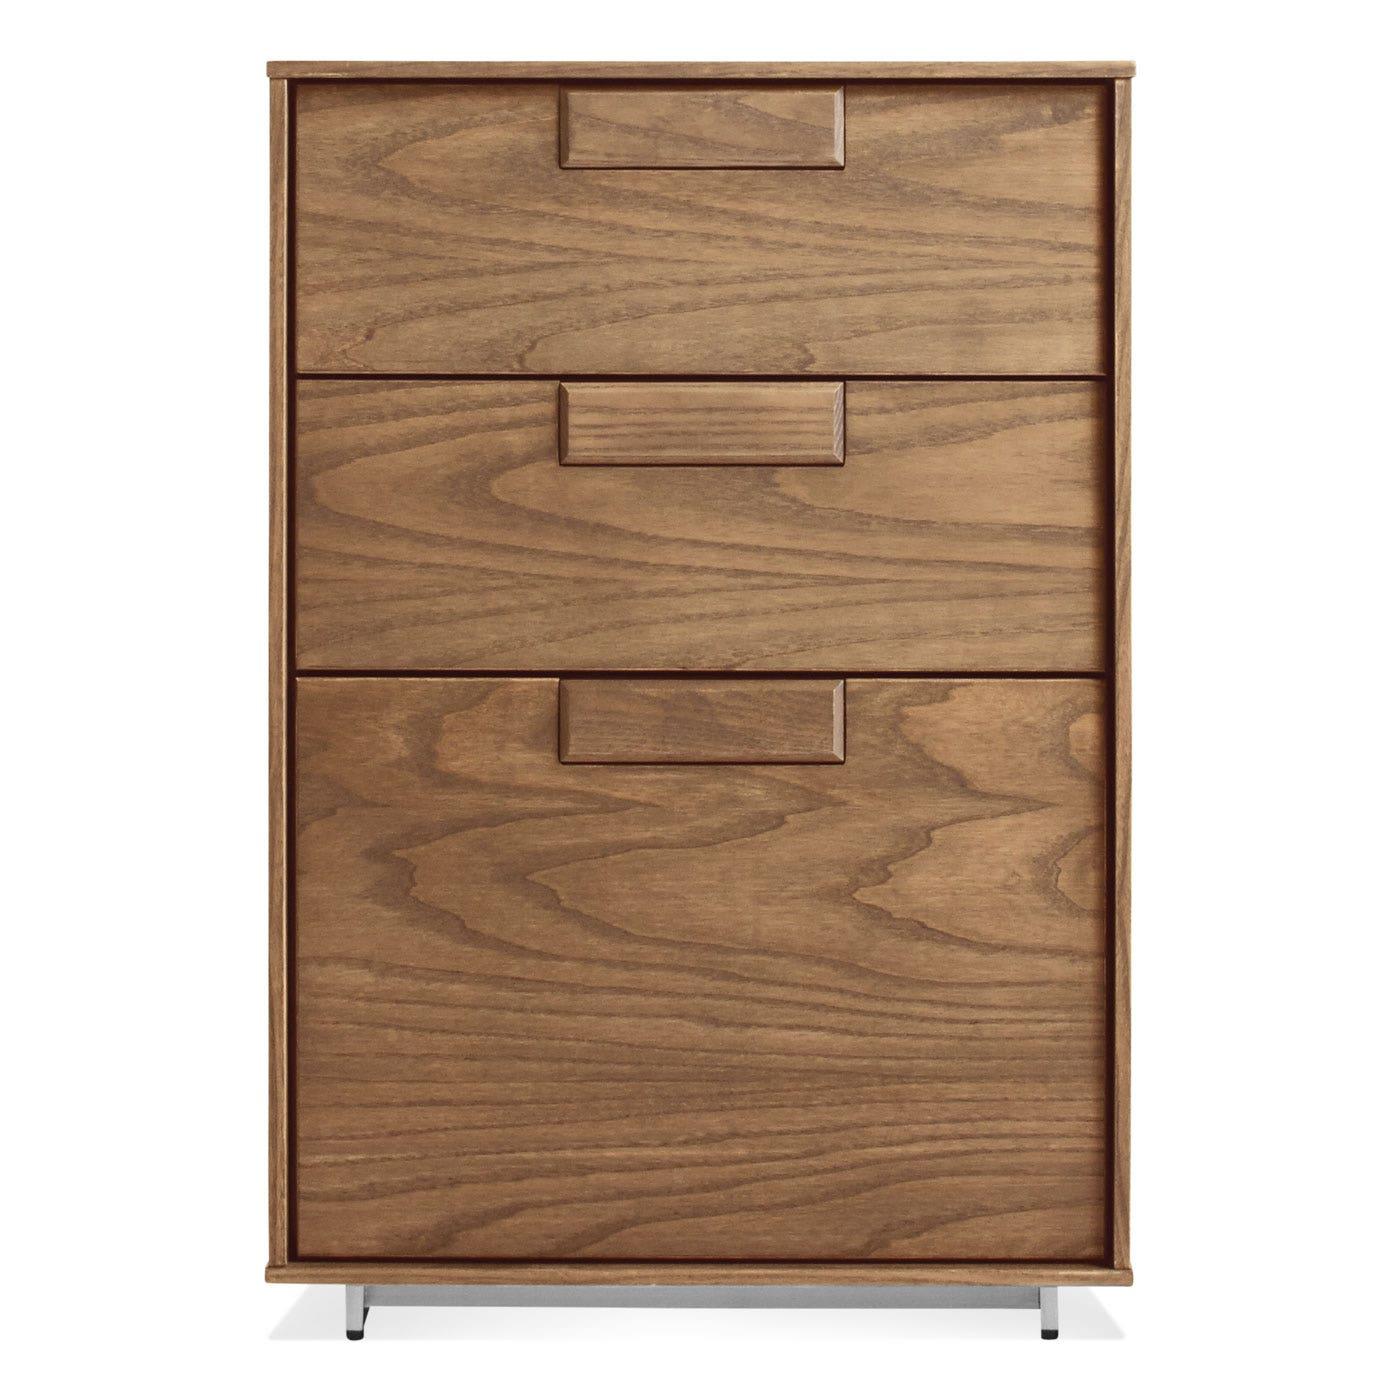 series  modern wood filing cabinet  blu dot - previous image series  modern wood filing cabinet